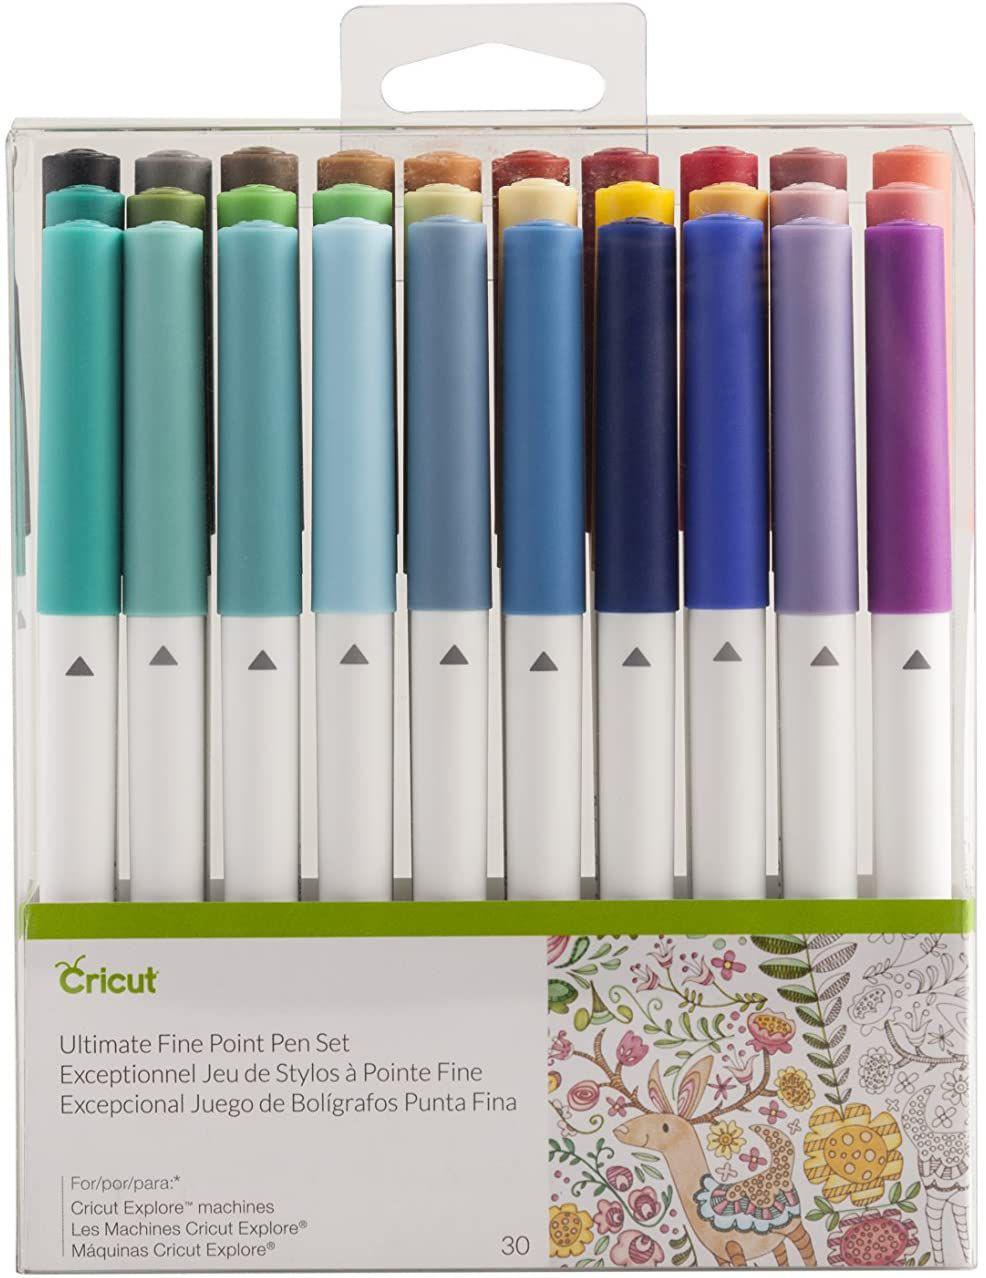 Cricut Pen Set